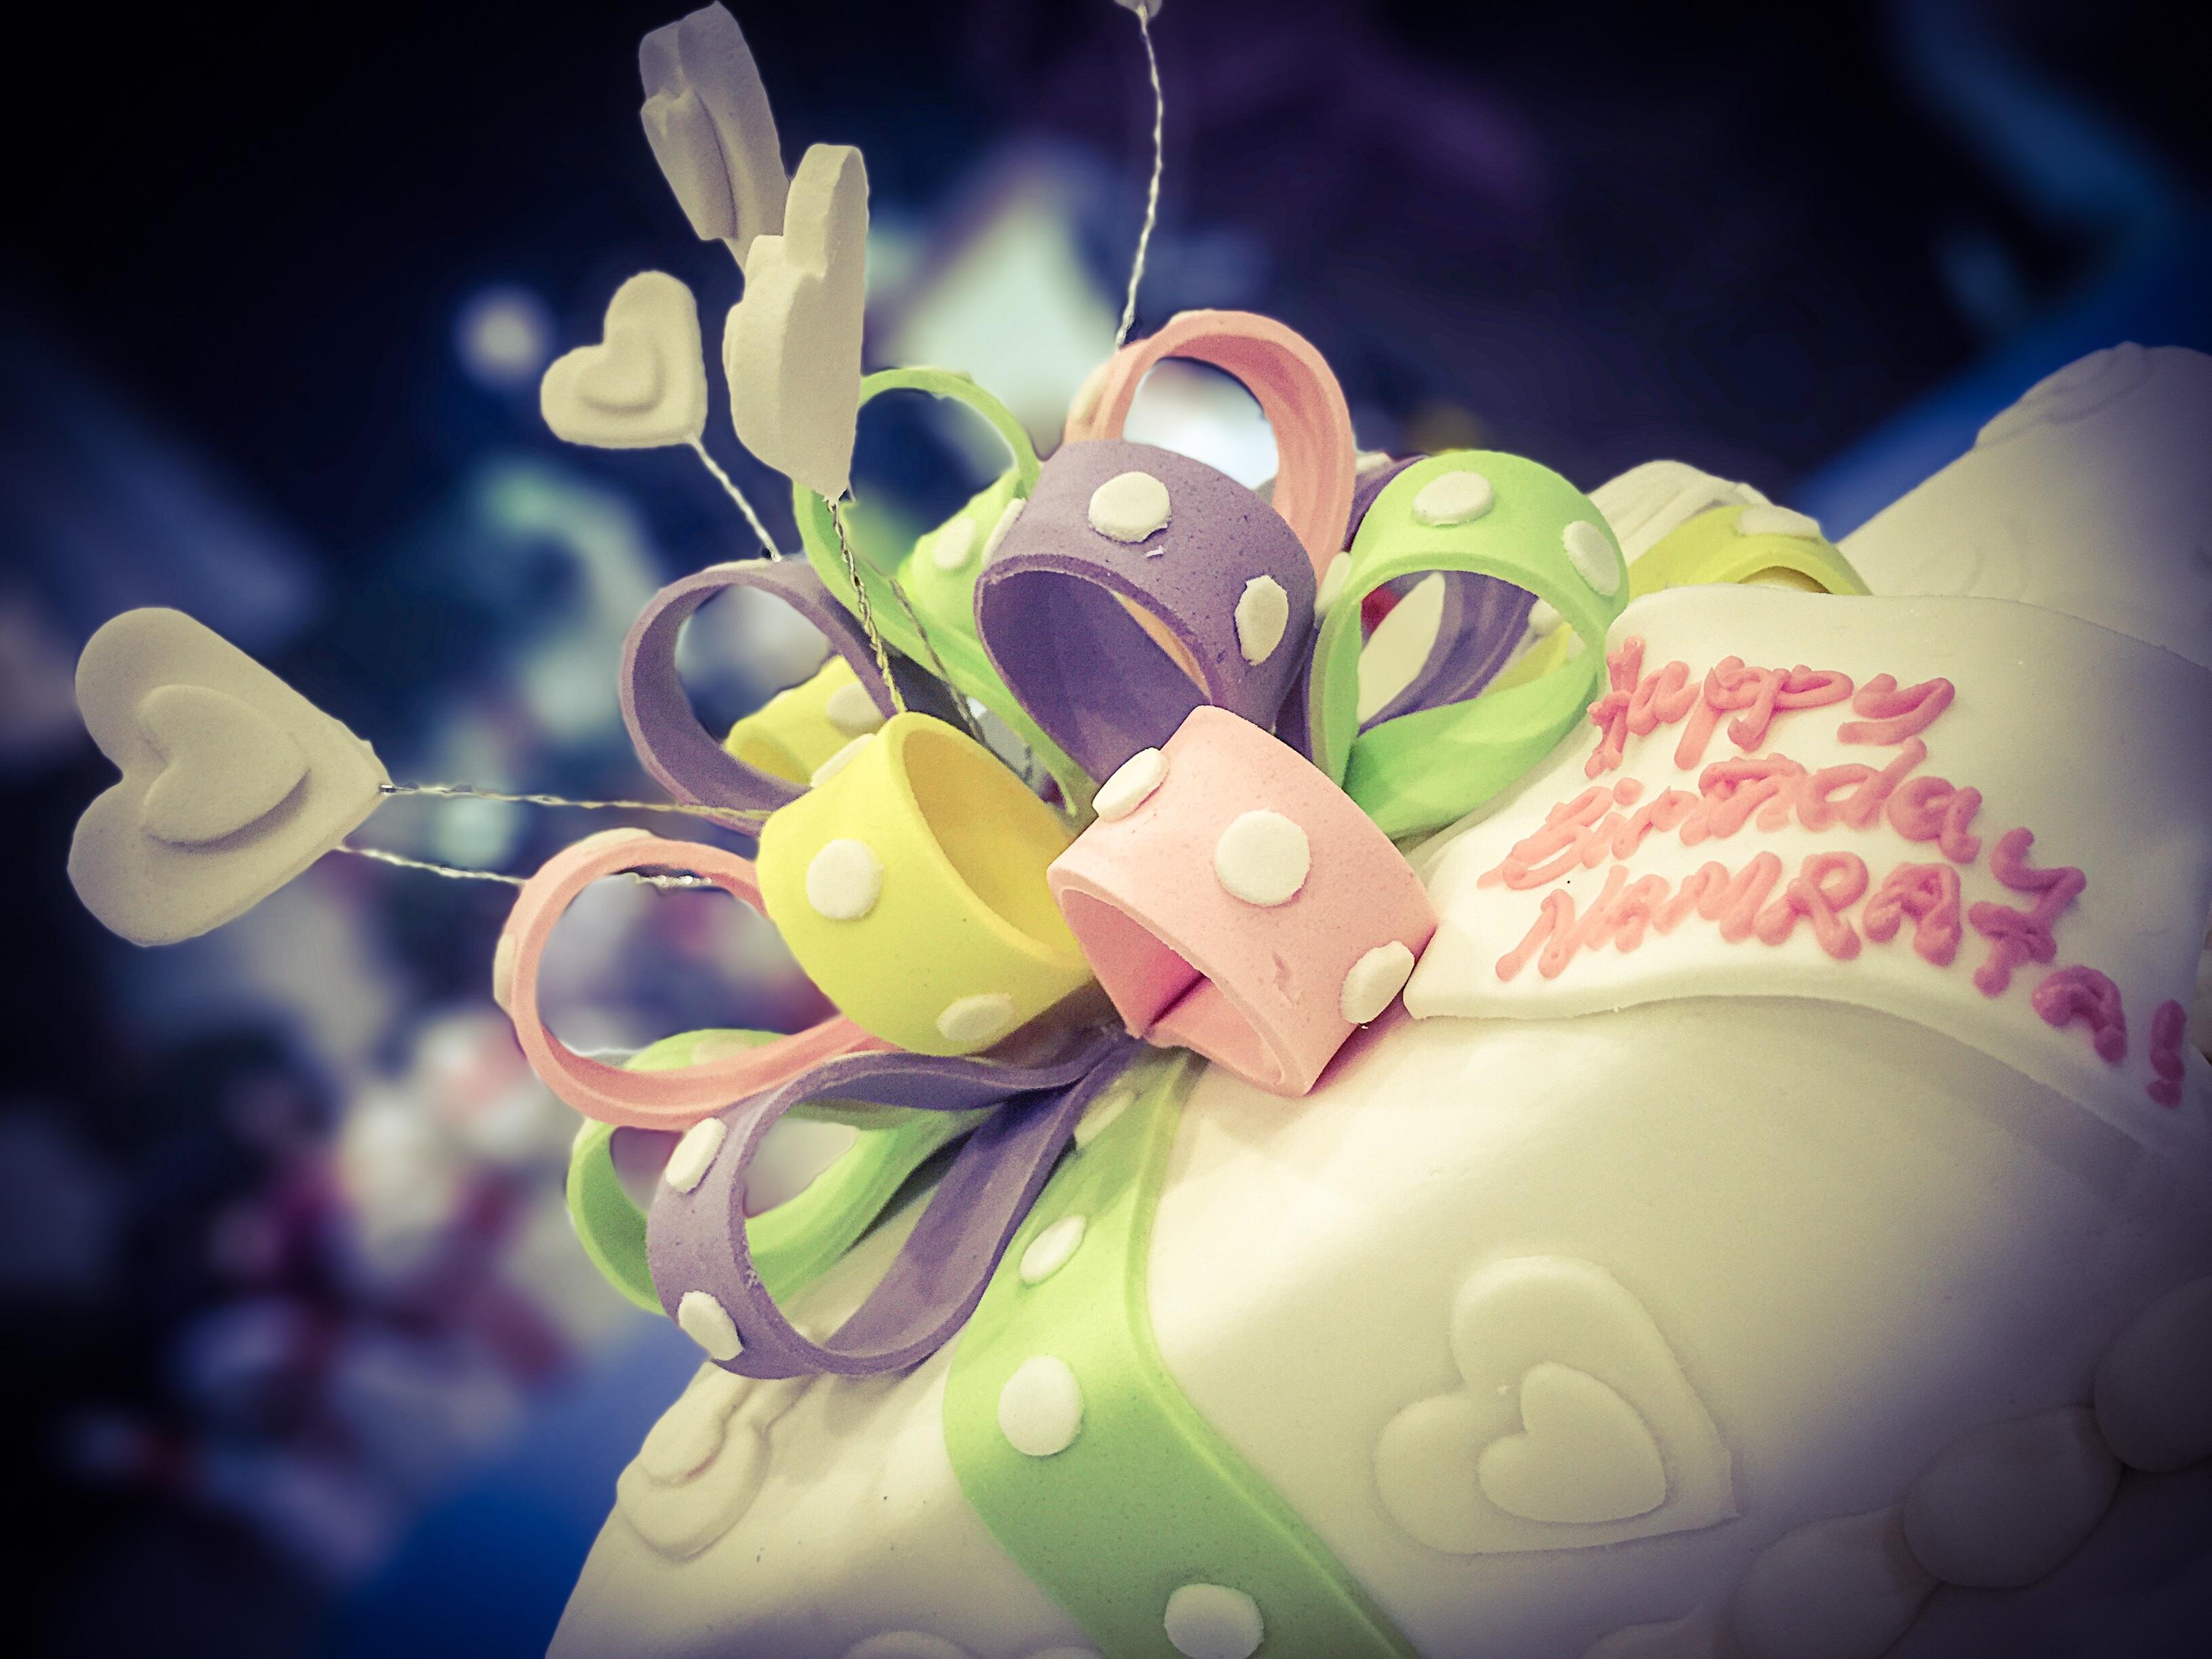 Free images blossom white sweet round petal heart decoration free images blossom white sweet round petal heart decoration food gourmet dessert eat flora cream delicious bakery celebrate birthday cake mightylinksfo